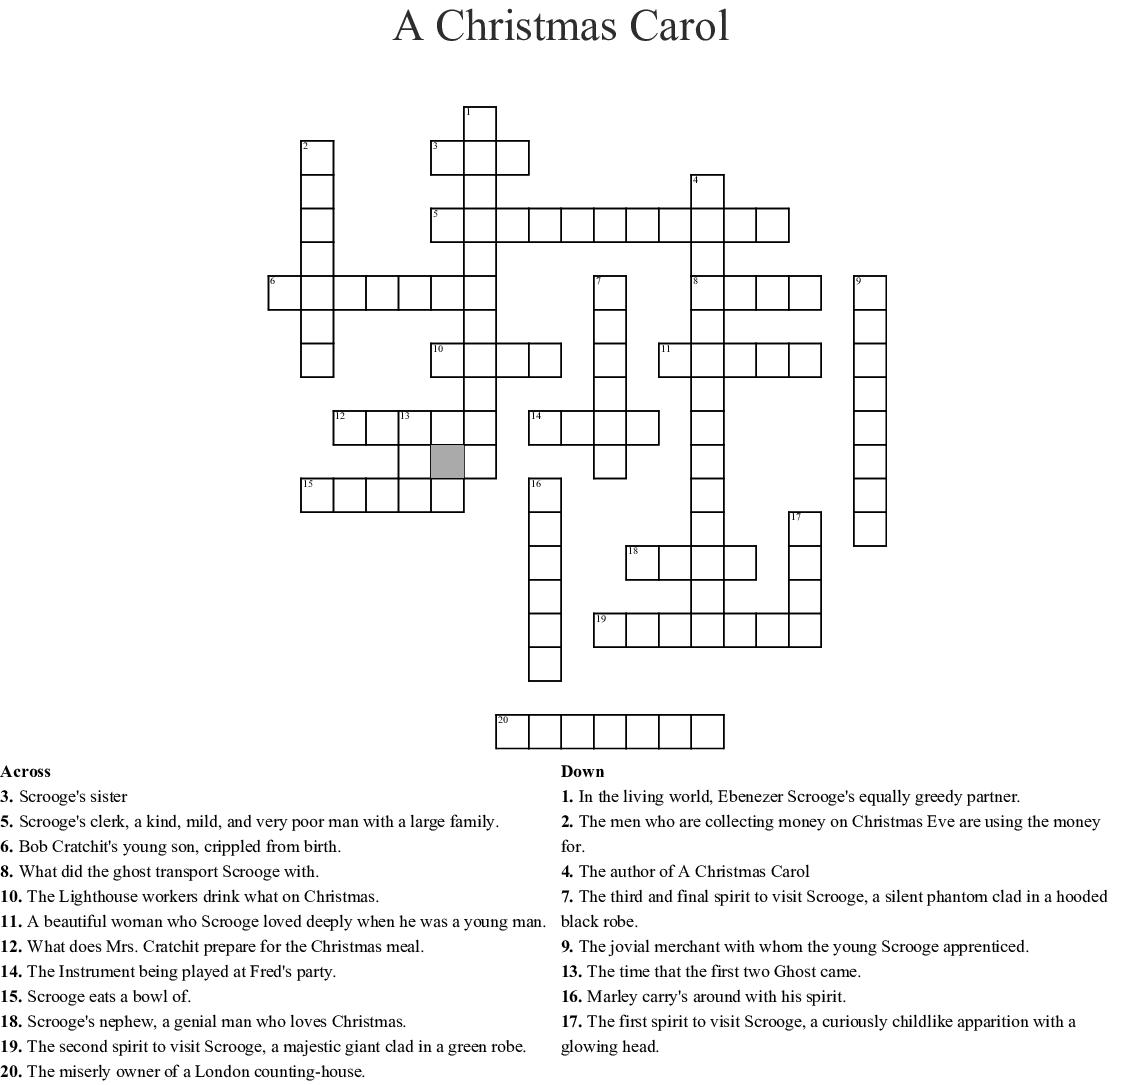 A Christmas Carol Word Search - WordMint